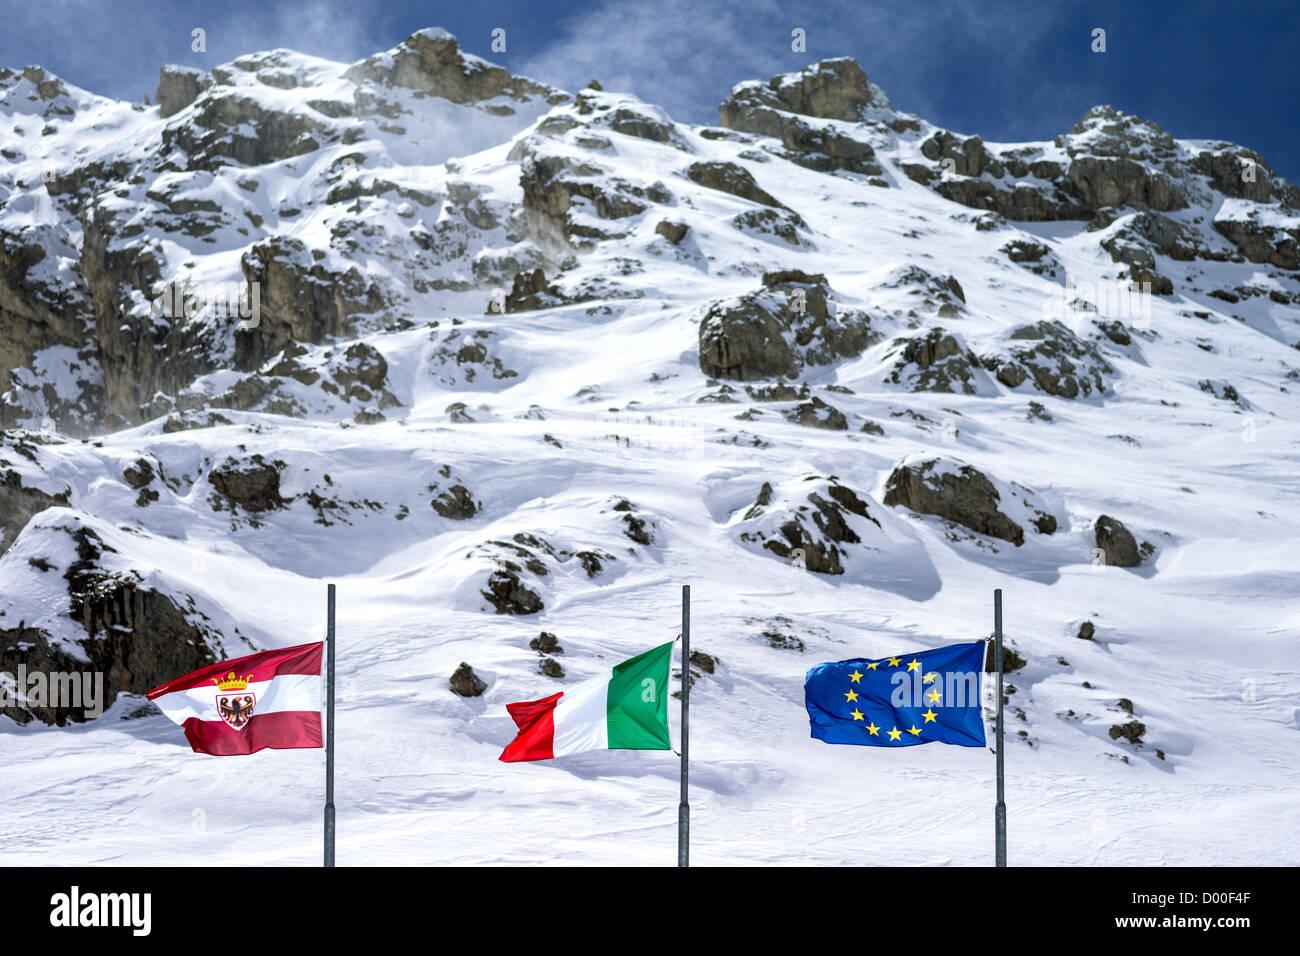 Italy, Dolomites, Trentino Alto Adige, flags in the the Pordoi Pass - Stock Image